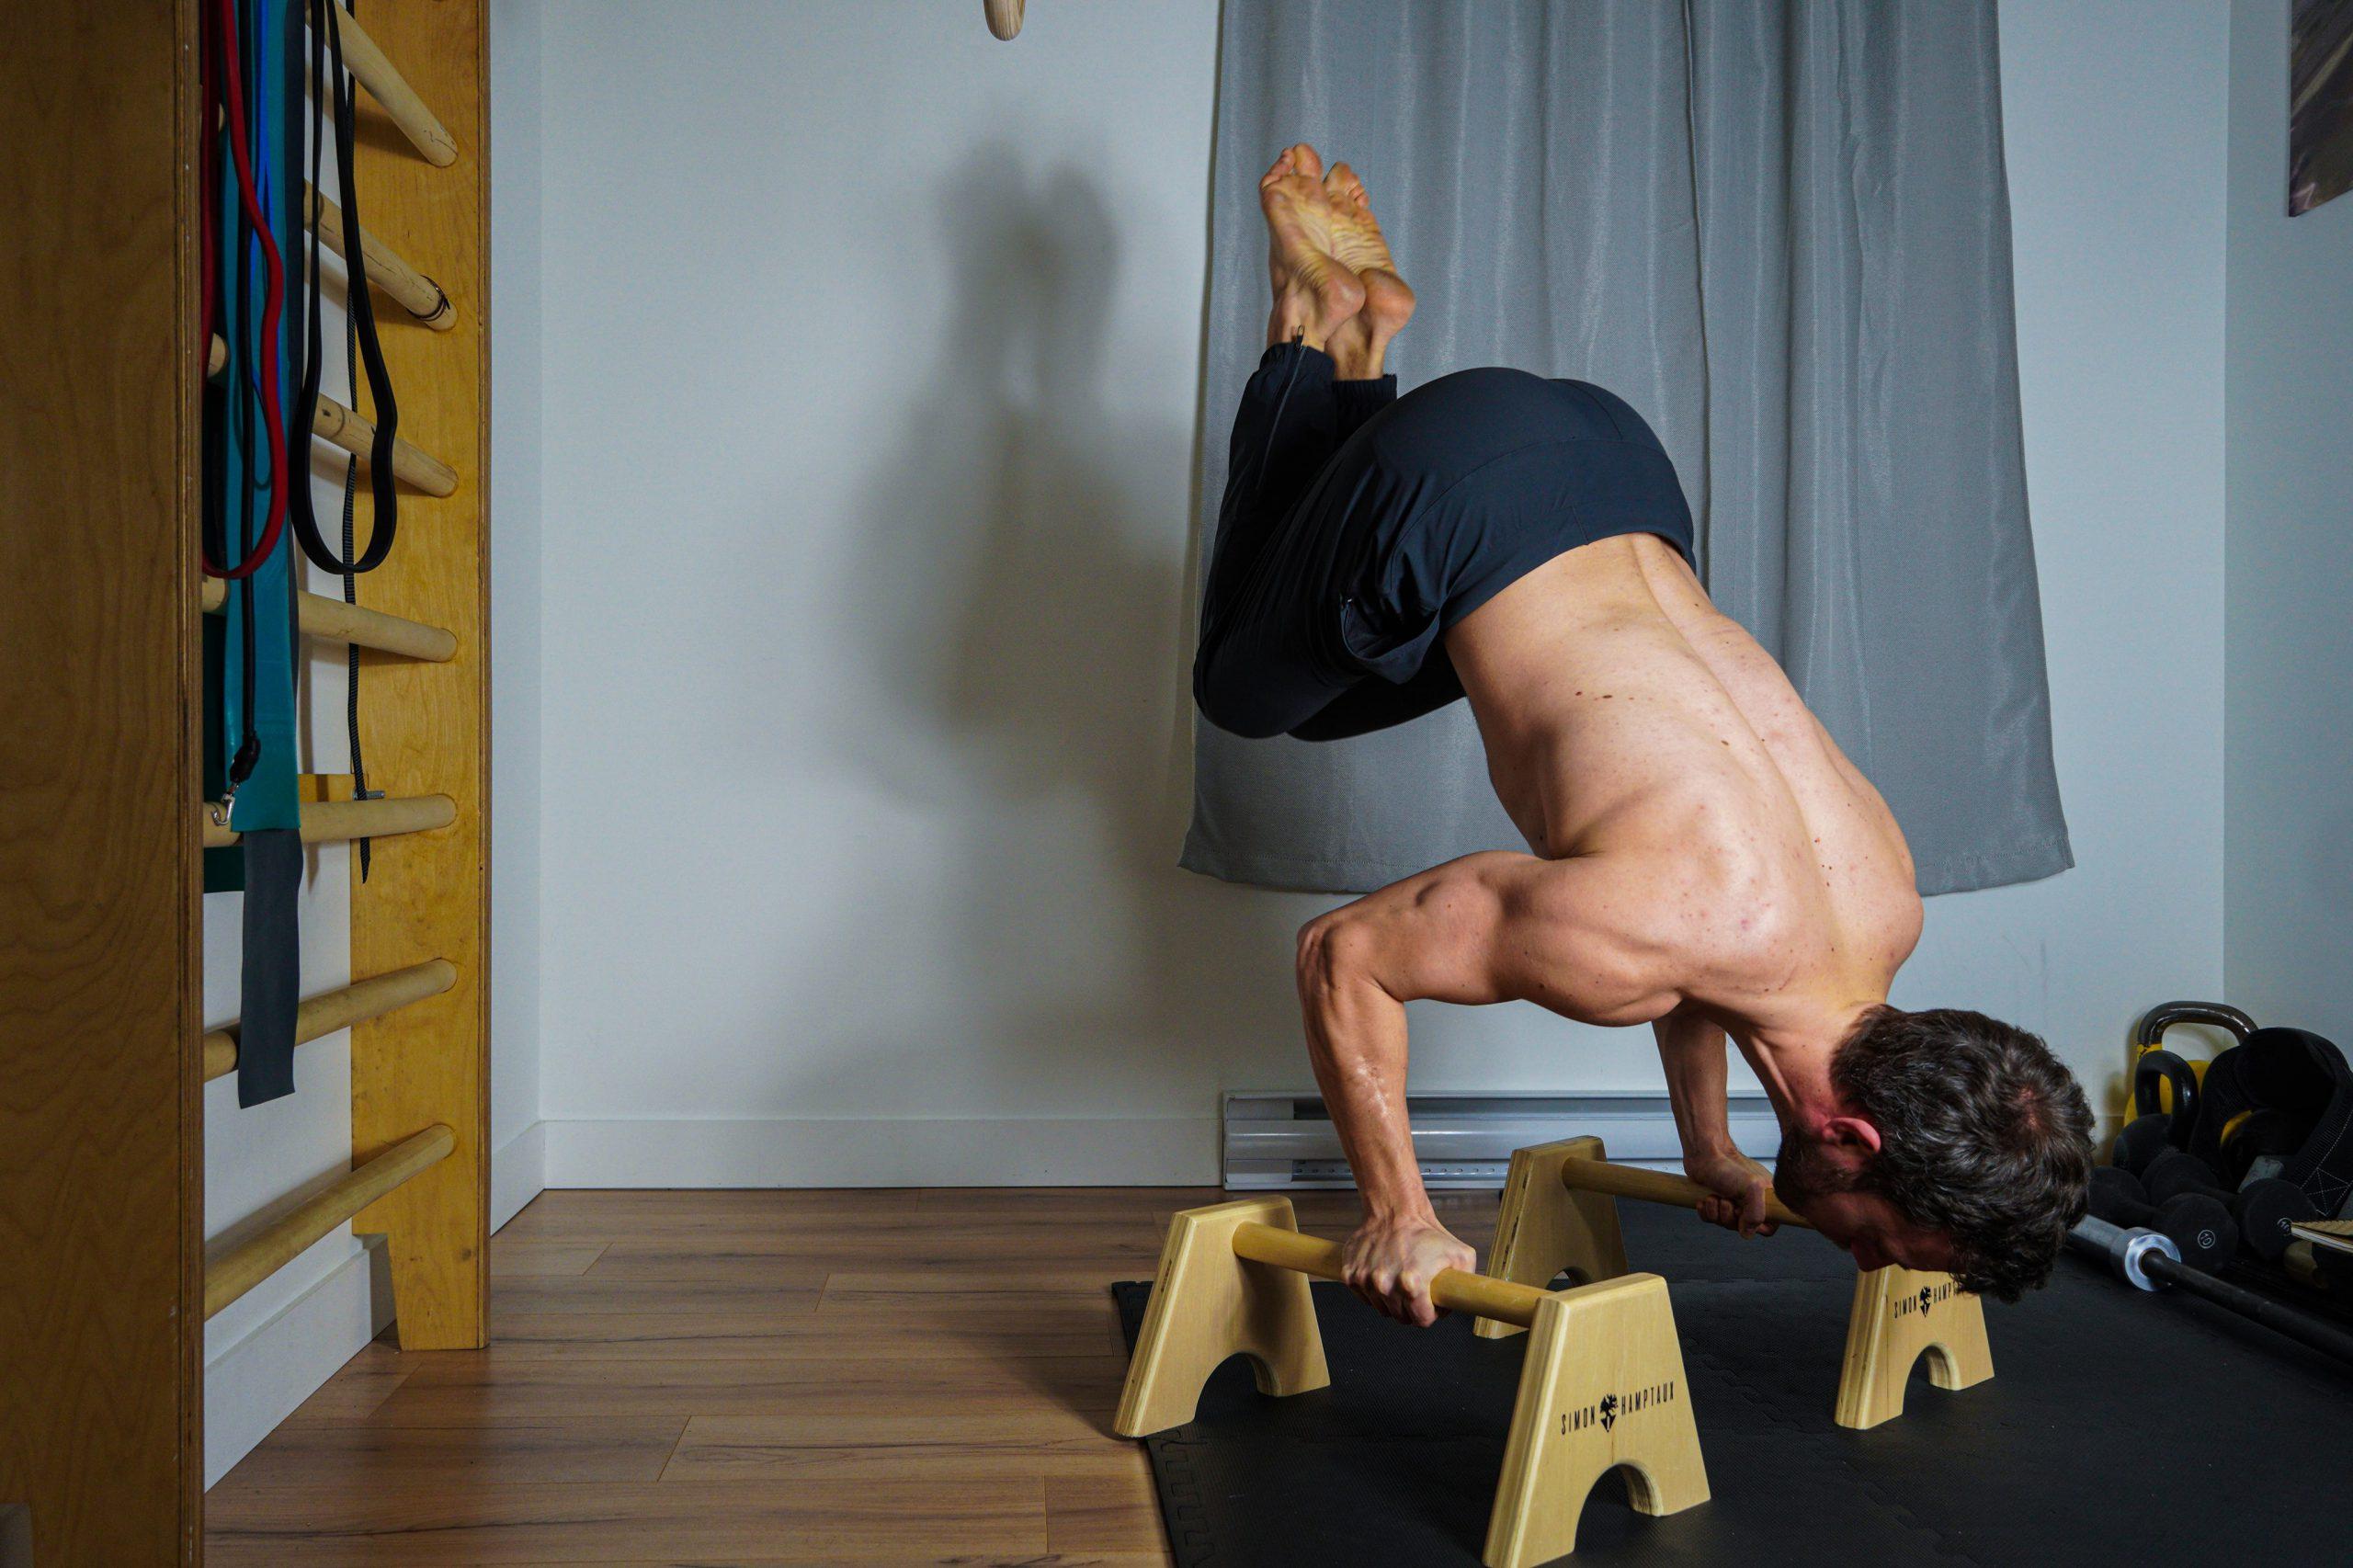 Réussir le l-sit to bent arm press to handstand